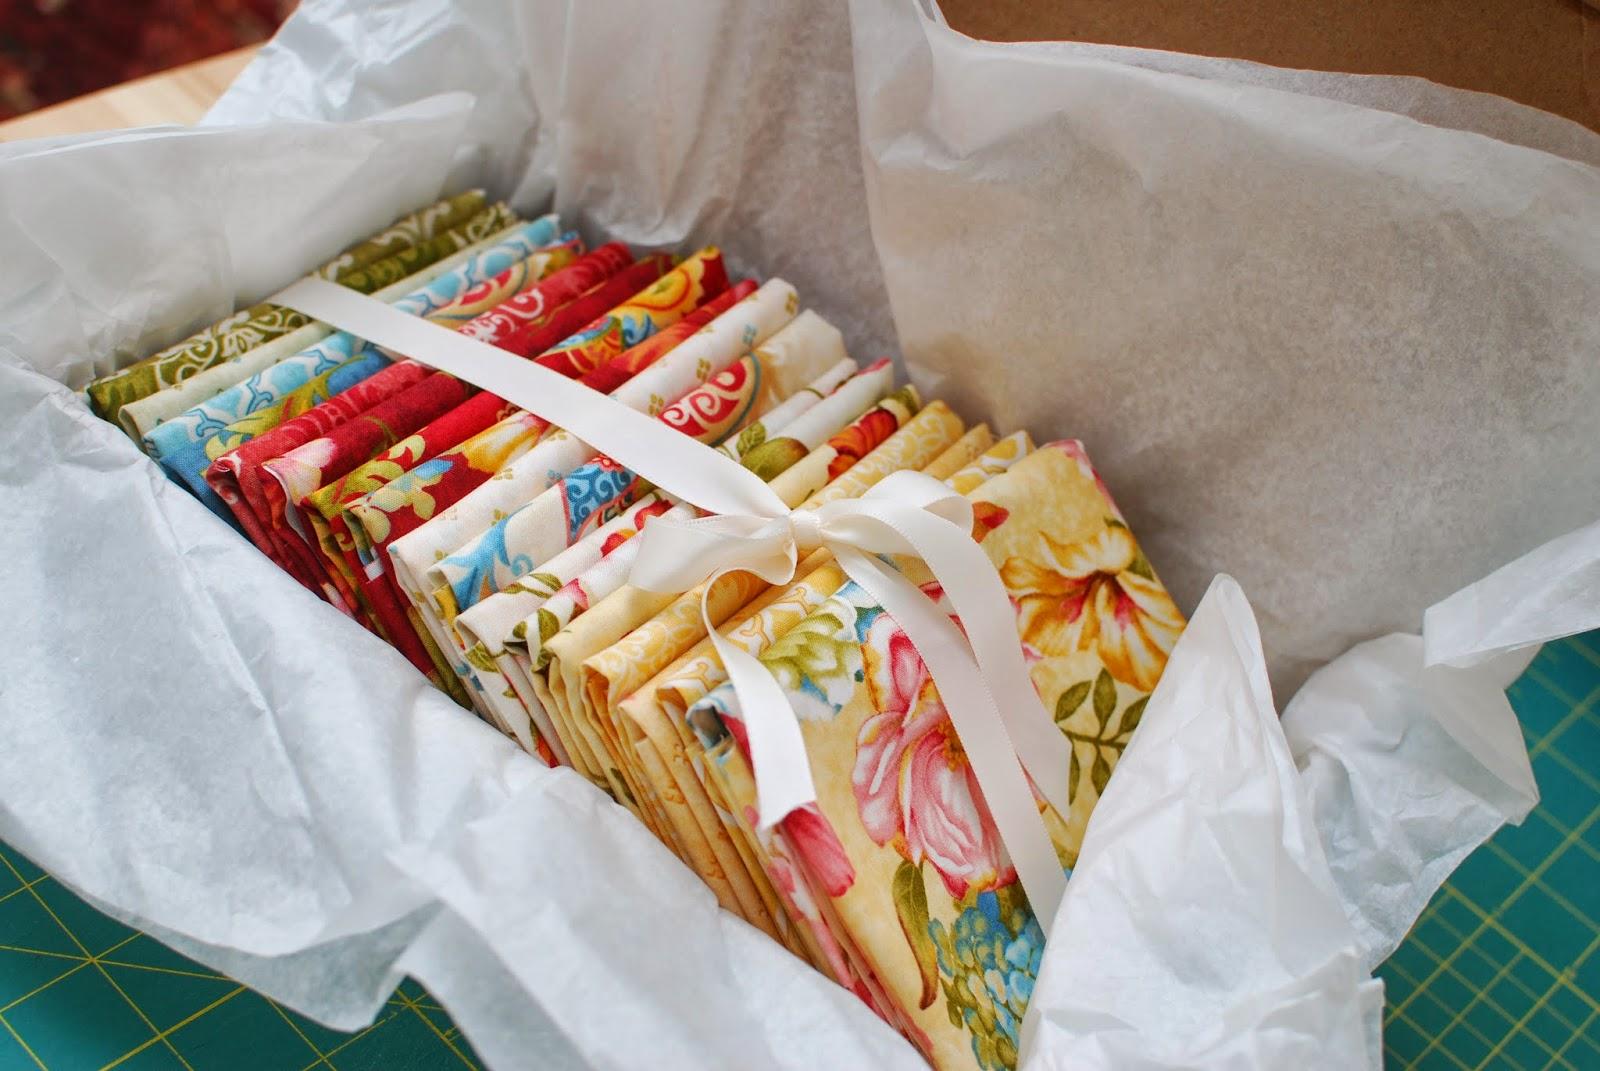 http://4.bp.blogspot.com/-o2e6lZnA8Wk/Uzbxfcb35bI/AAAAAAAAIvA/71XPBhH03rE/s1600/flower%2Bgirl%2Bgive%2Baway.jpg